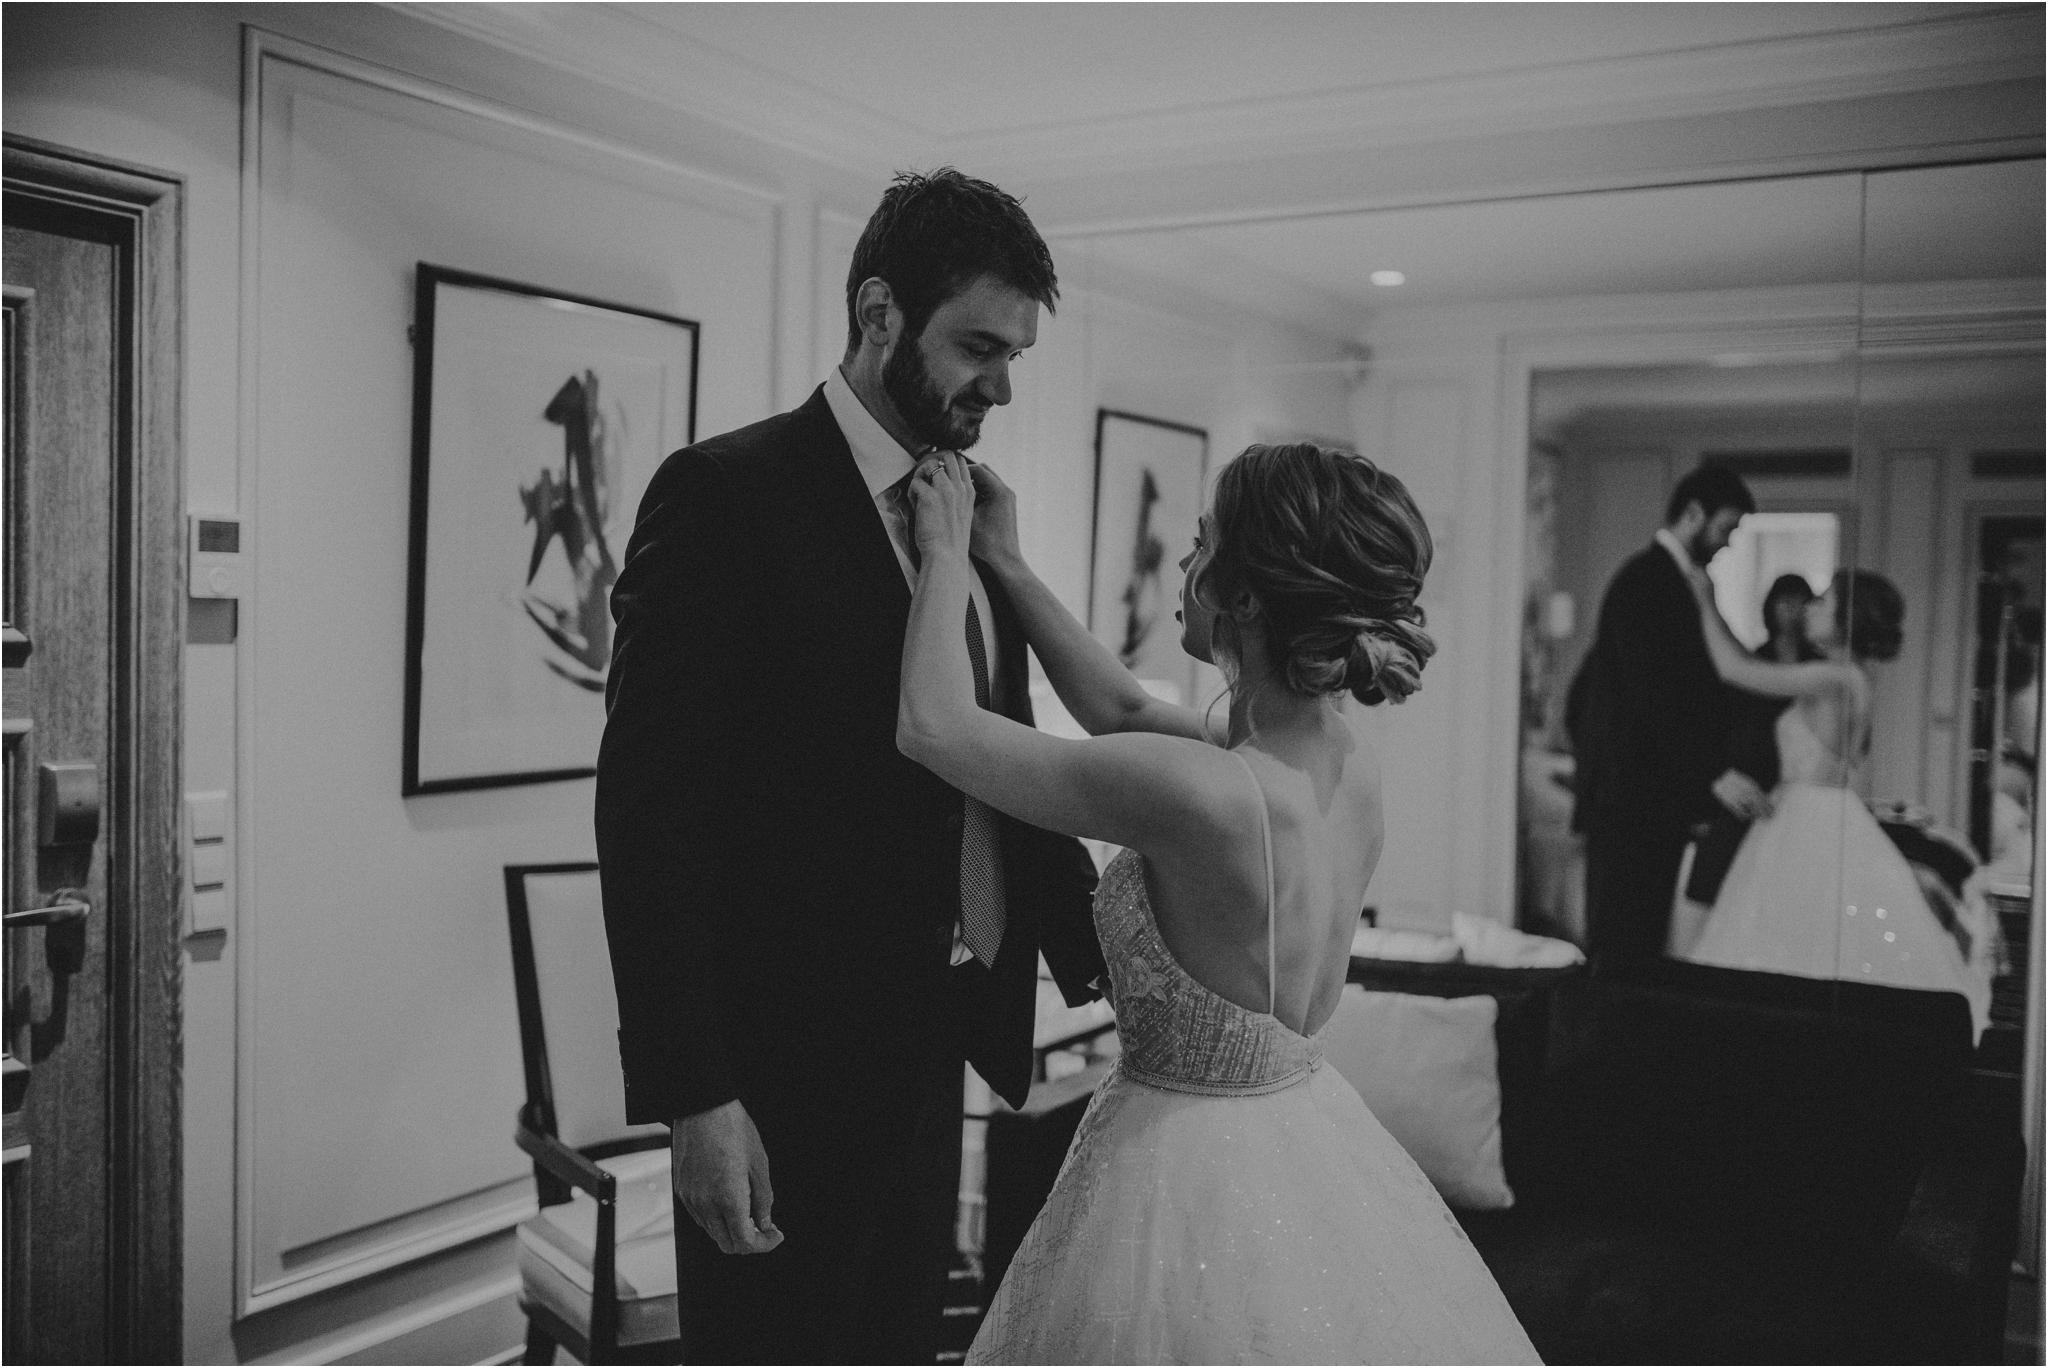 miranda-and-jared-paris-elopement-destination-wedding-photographer-016.jpg